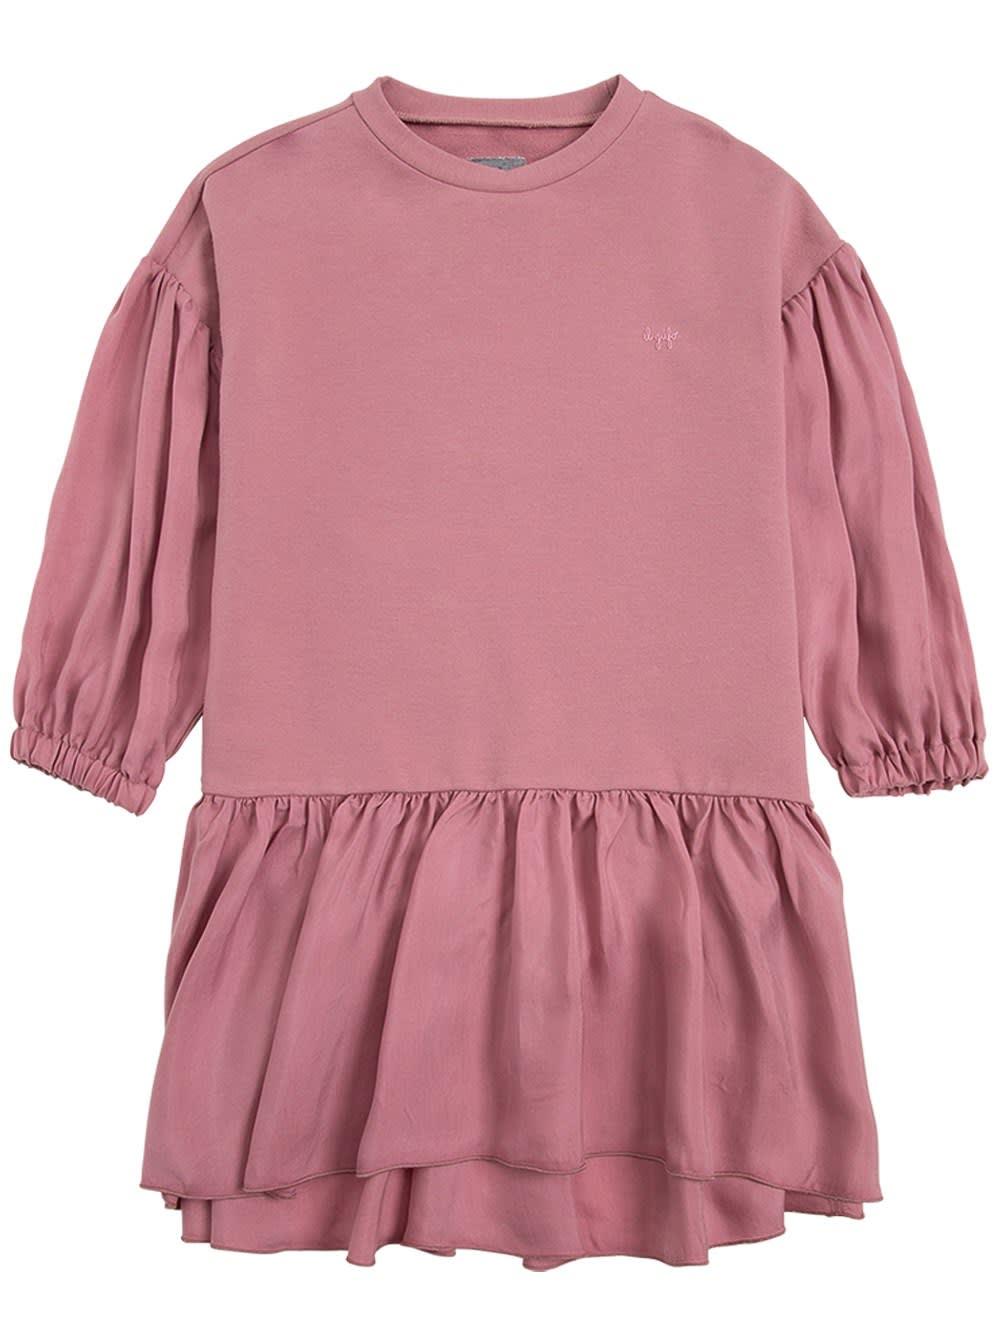 Organic Cotton Pink Dress With Flounces